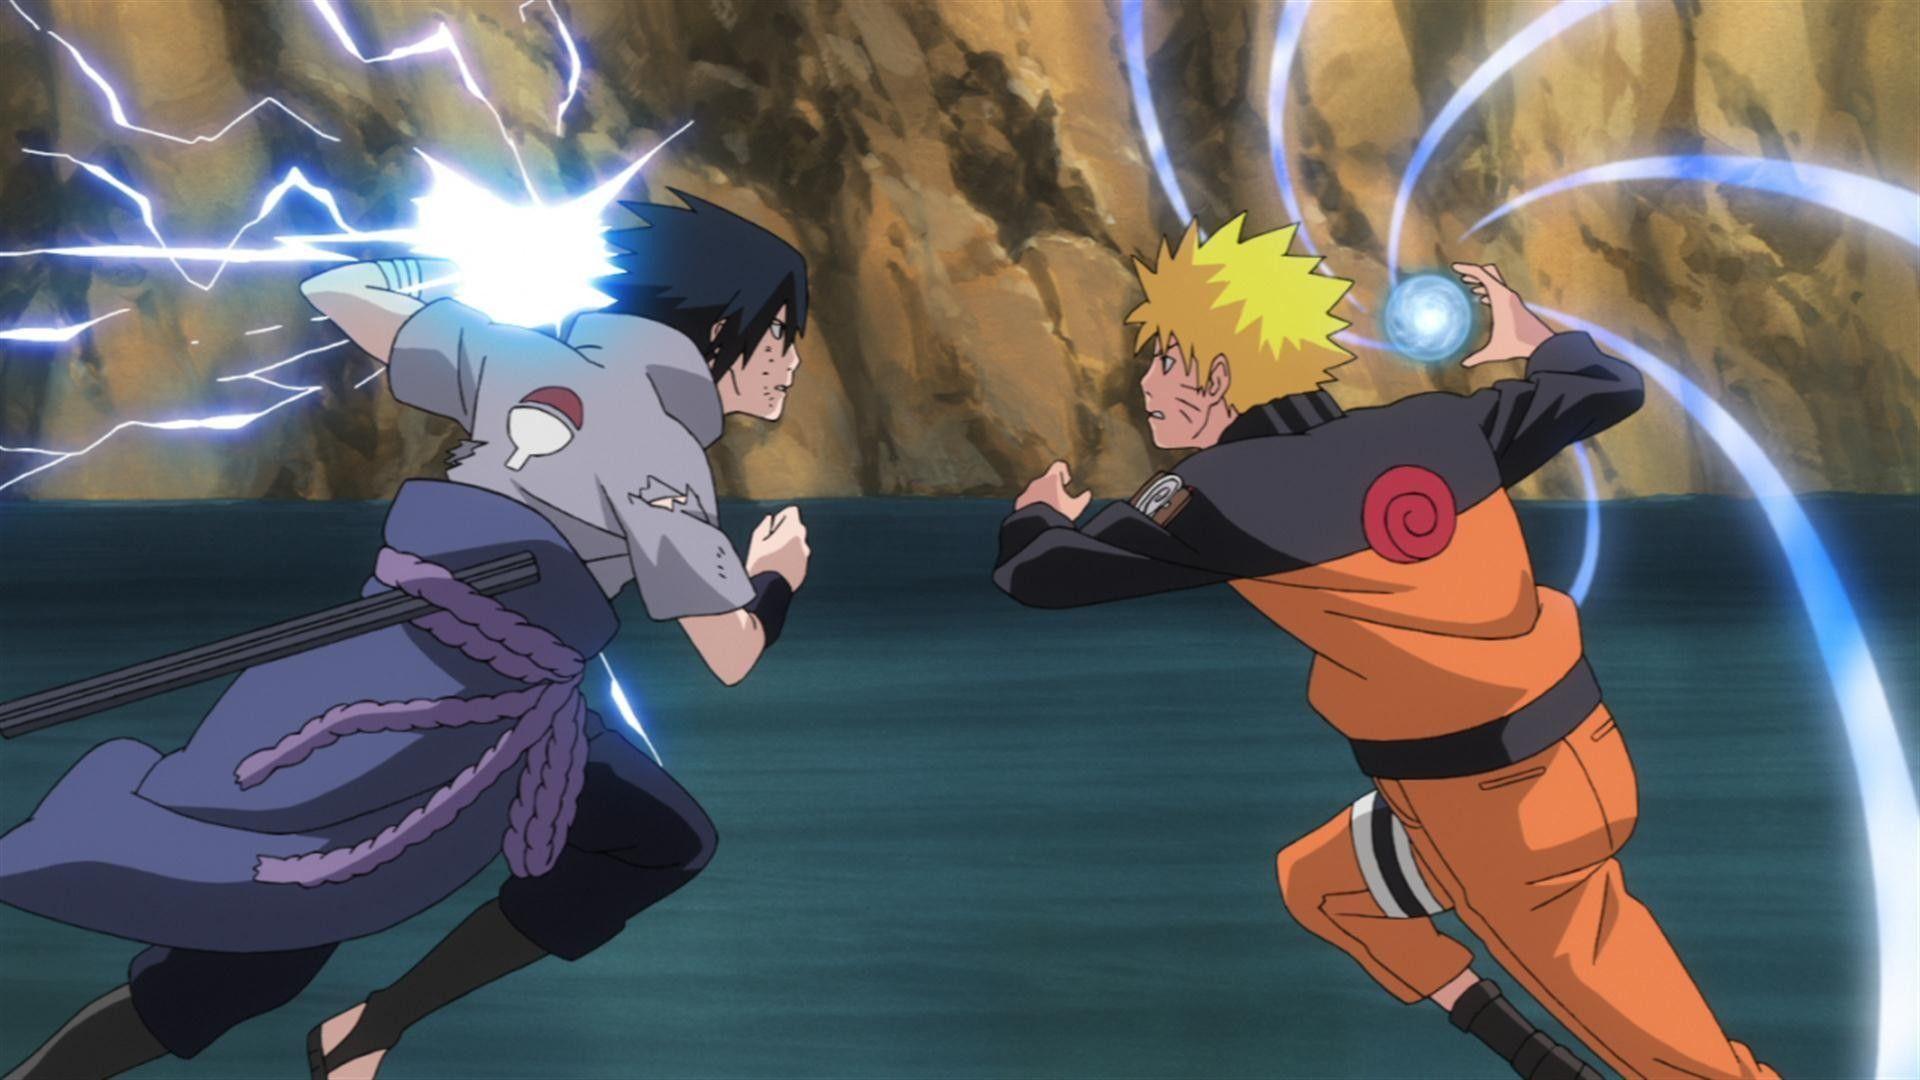 Wallpapers Naruto Vs Sasuke Wallpaper Cave